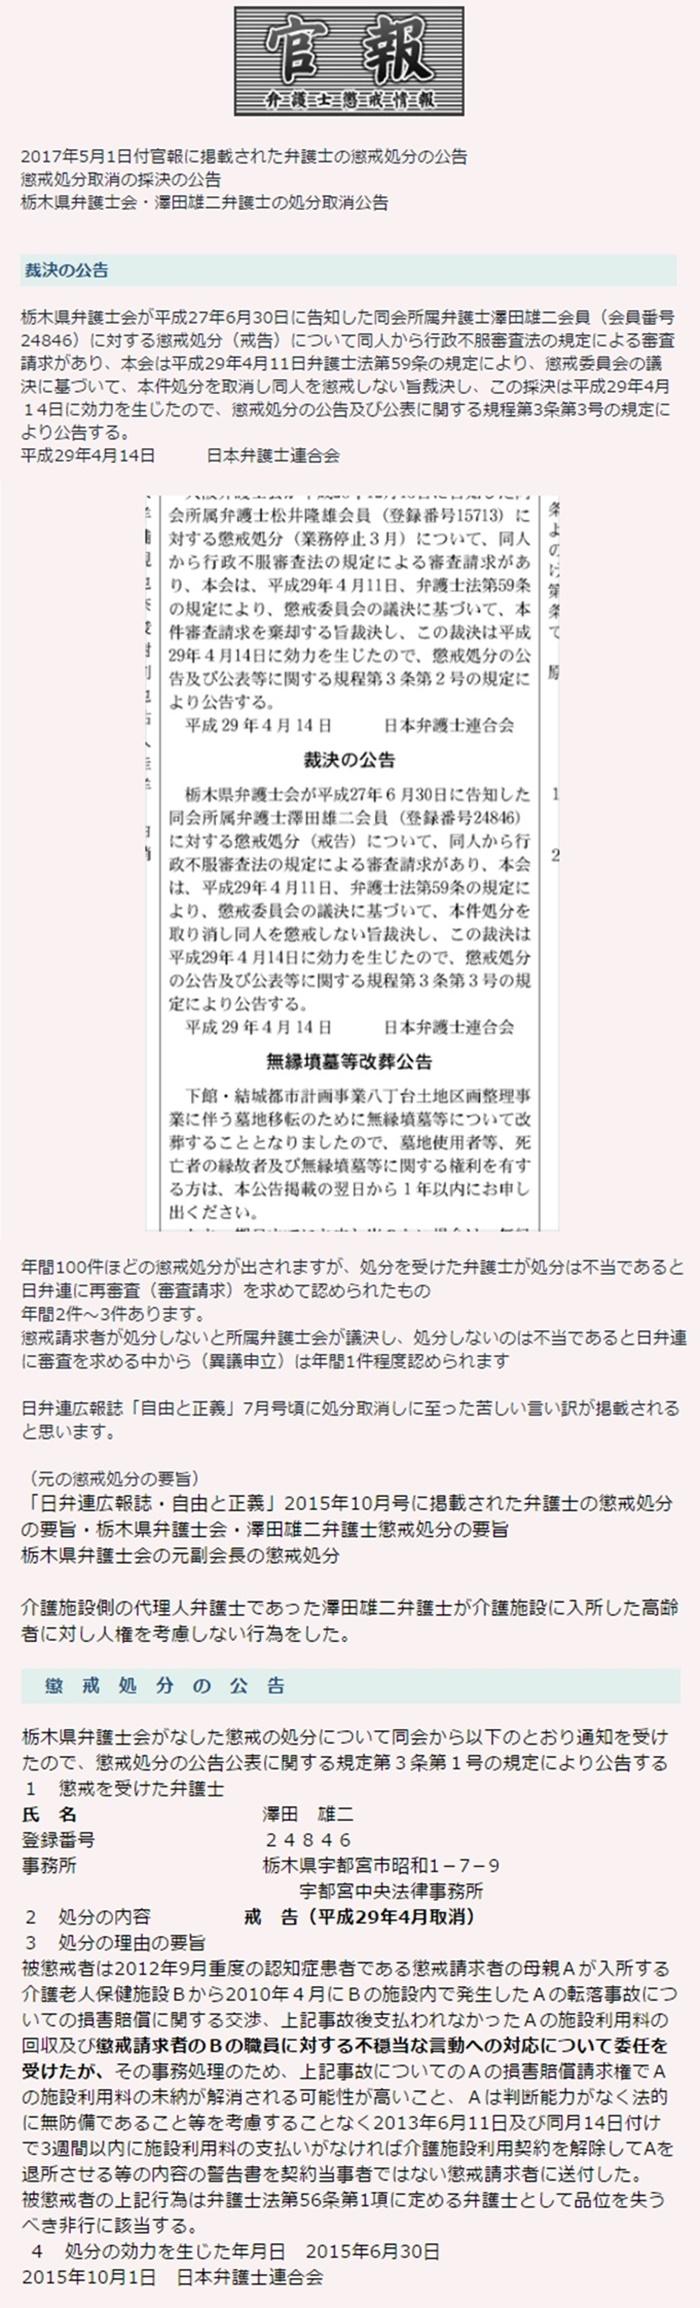 澤田雄二弁護士 懲戒取り消し 日弁連